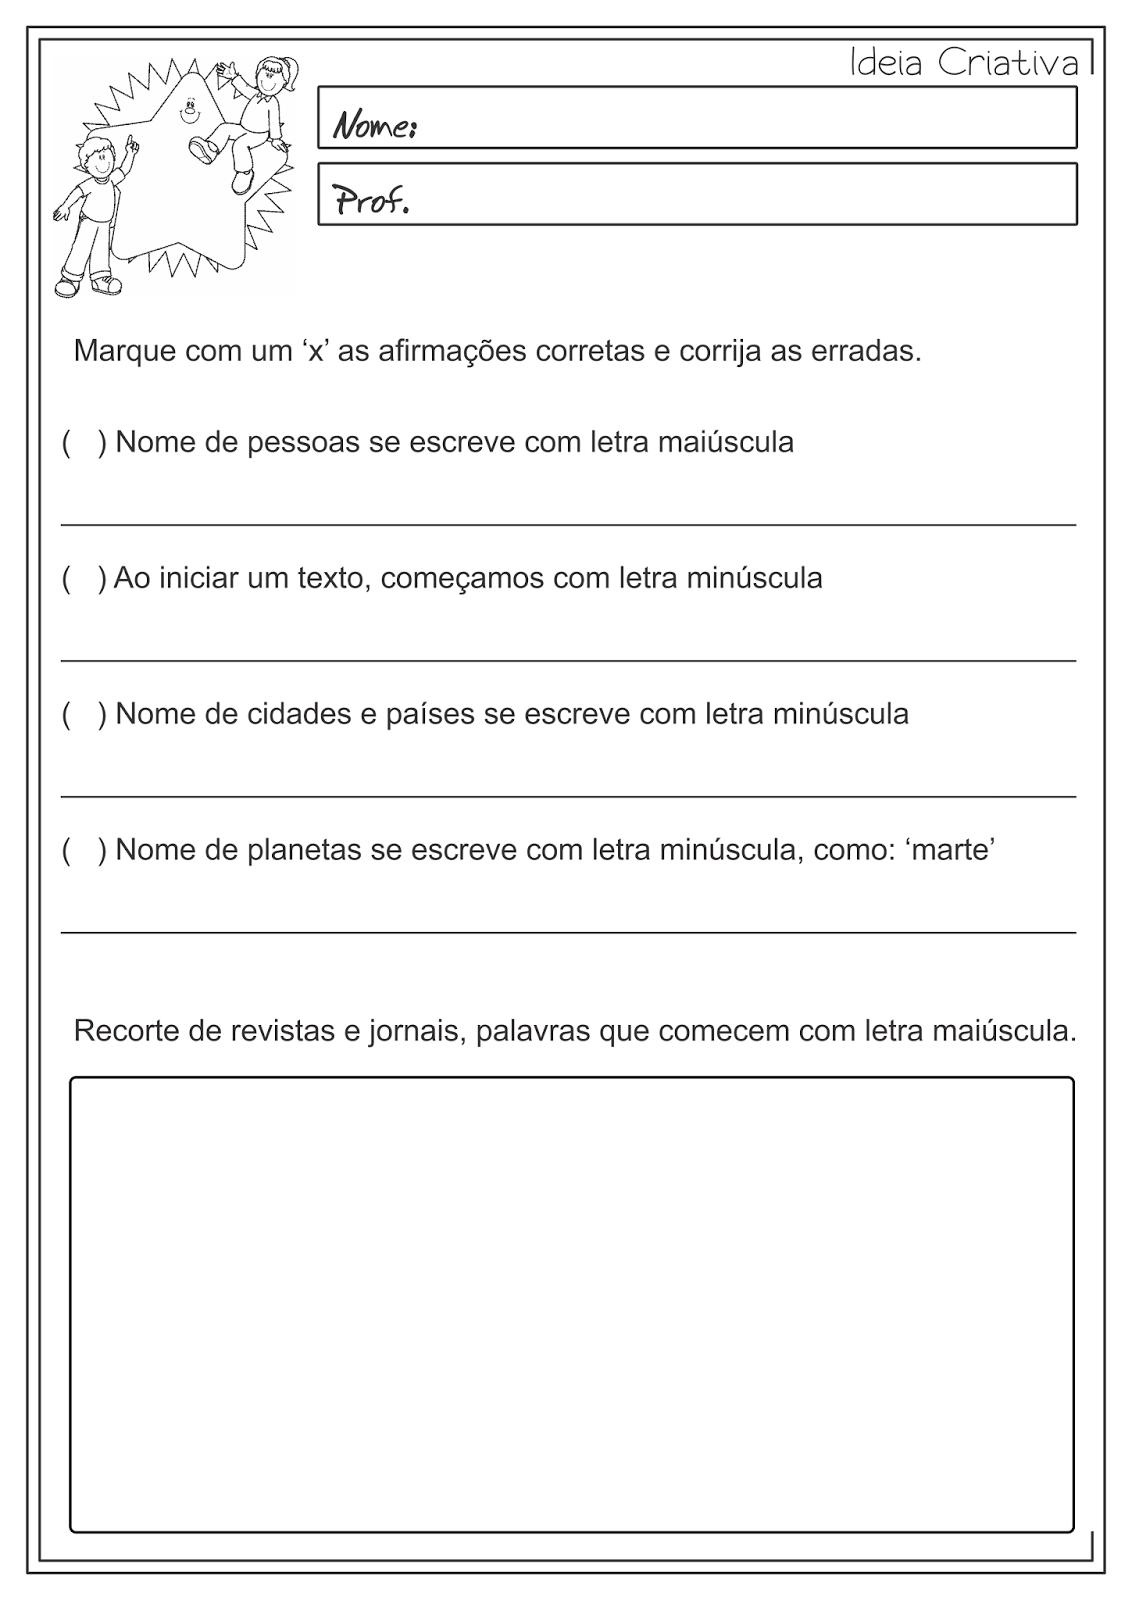 Atividades Educativas Nomes comuns e próprios Uso de Letra Maiúscula e Minúscula Língua Portuguesa 3° ano fundamental